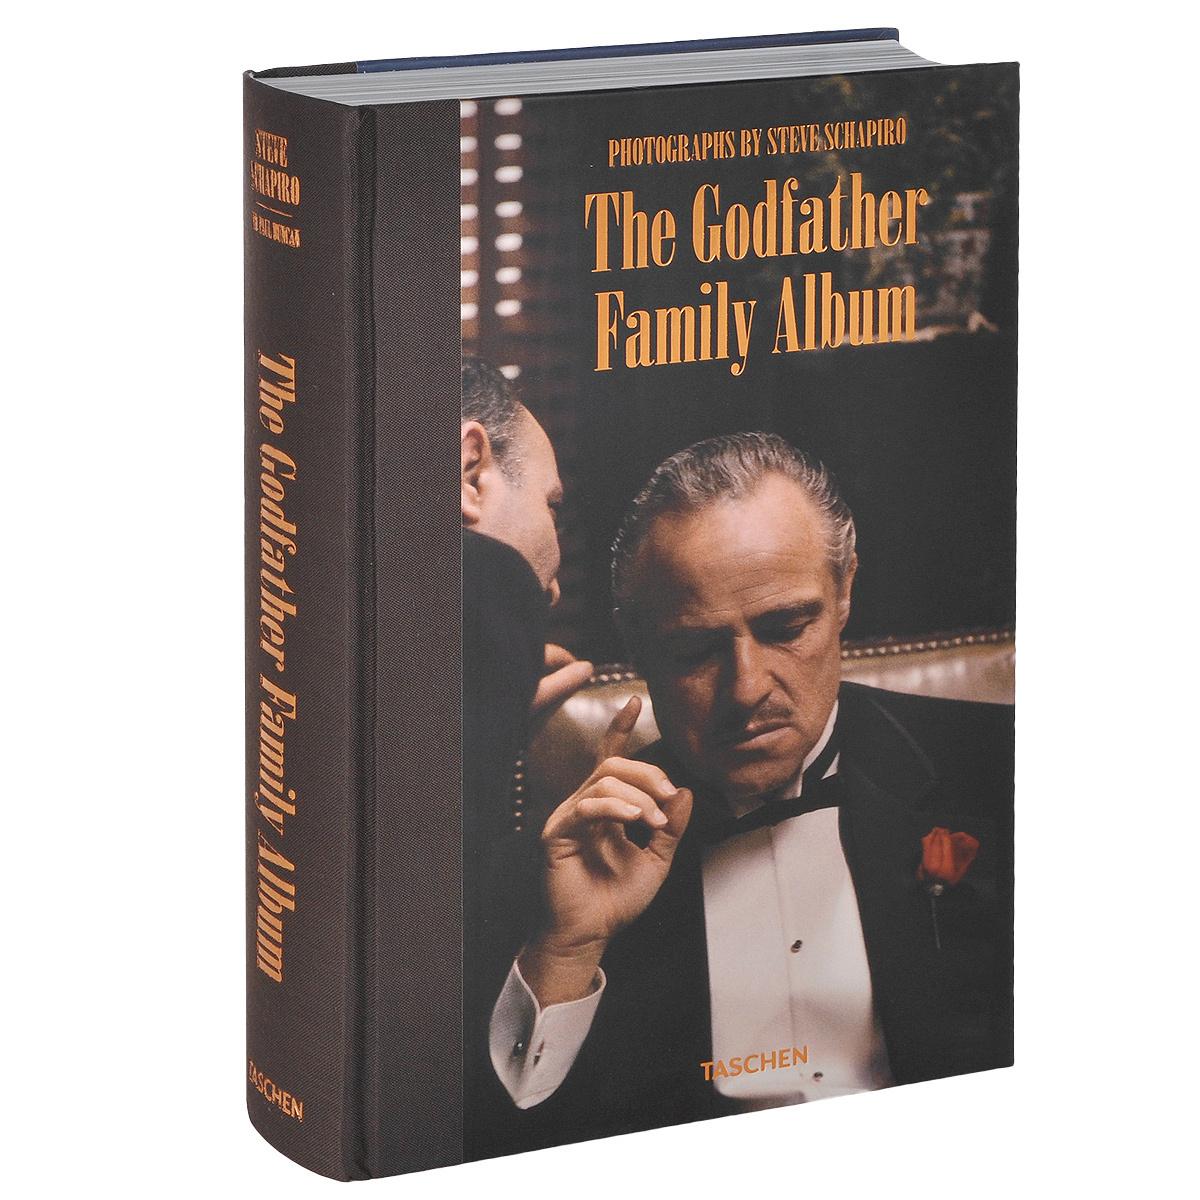 The Godfather Family Album #1